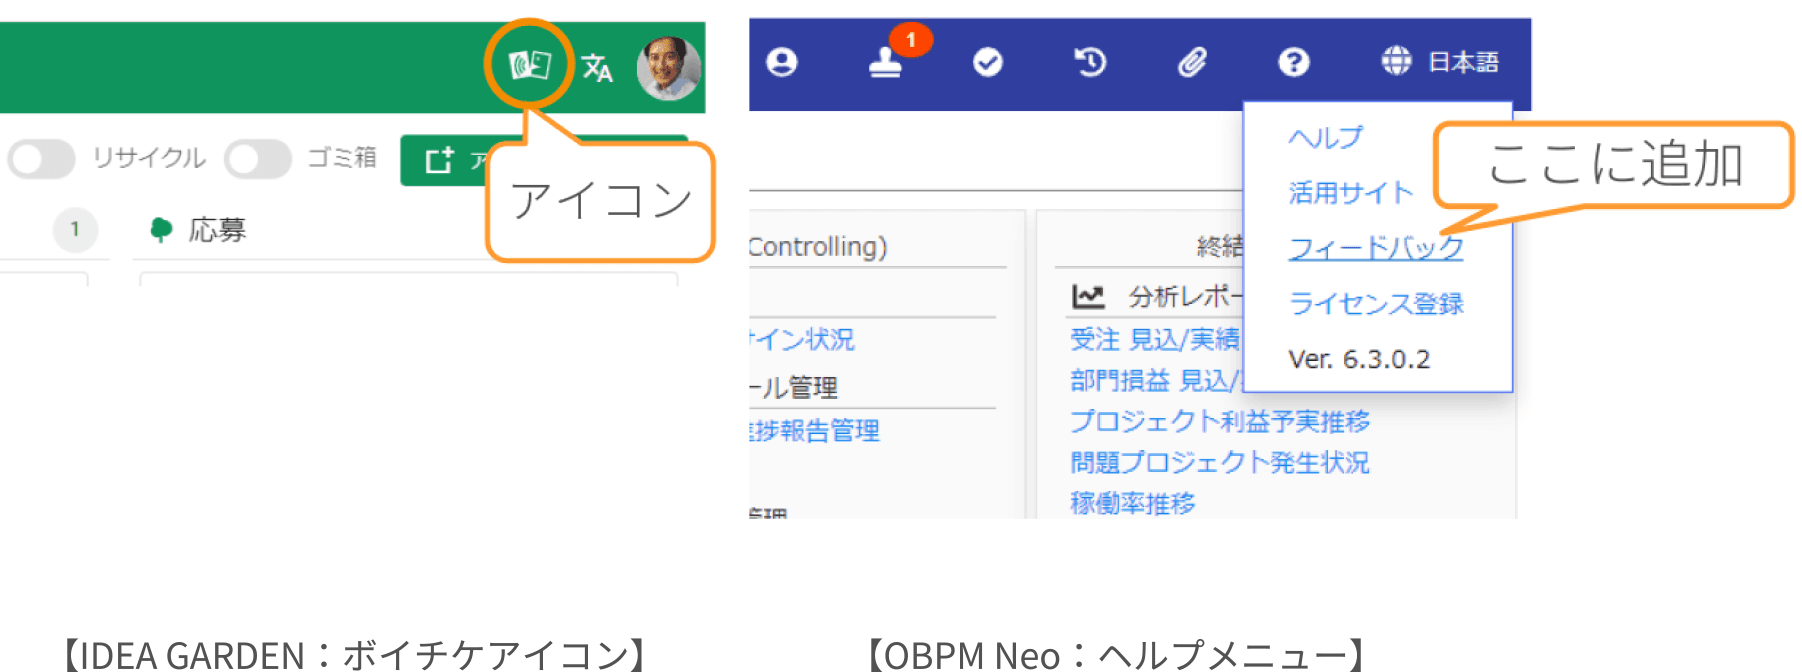 implementation_01